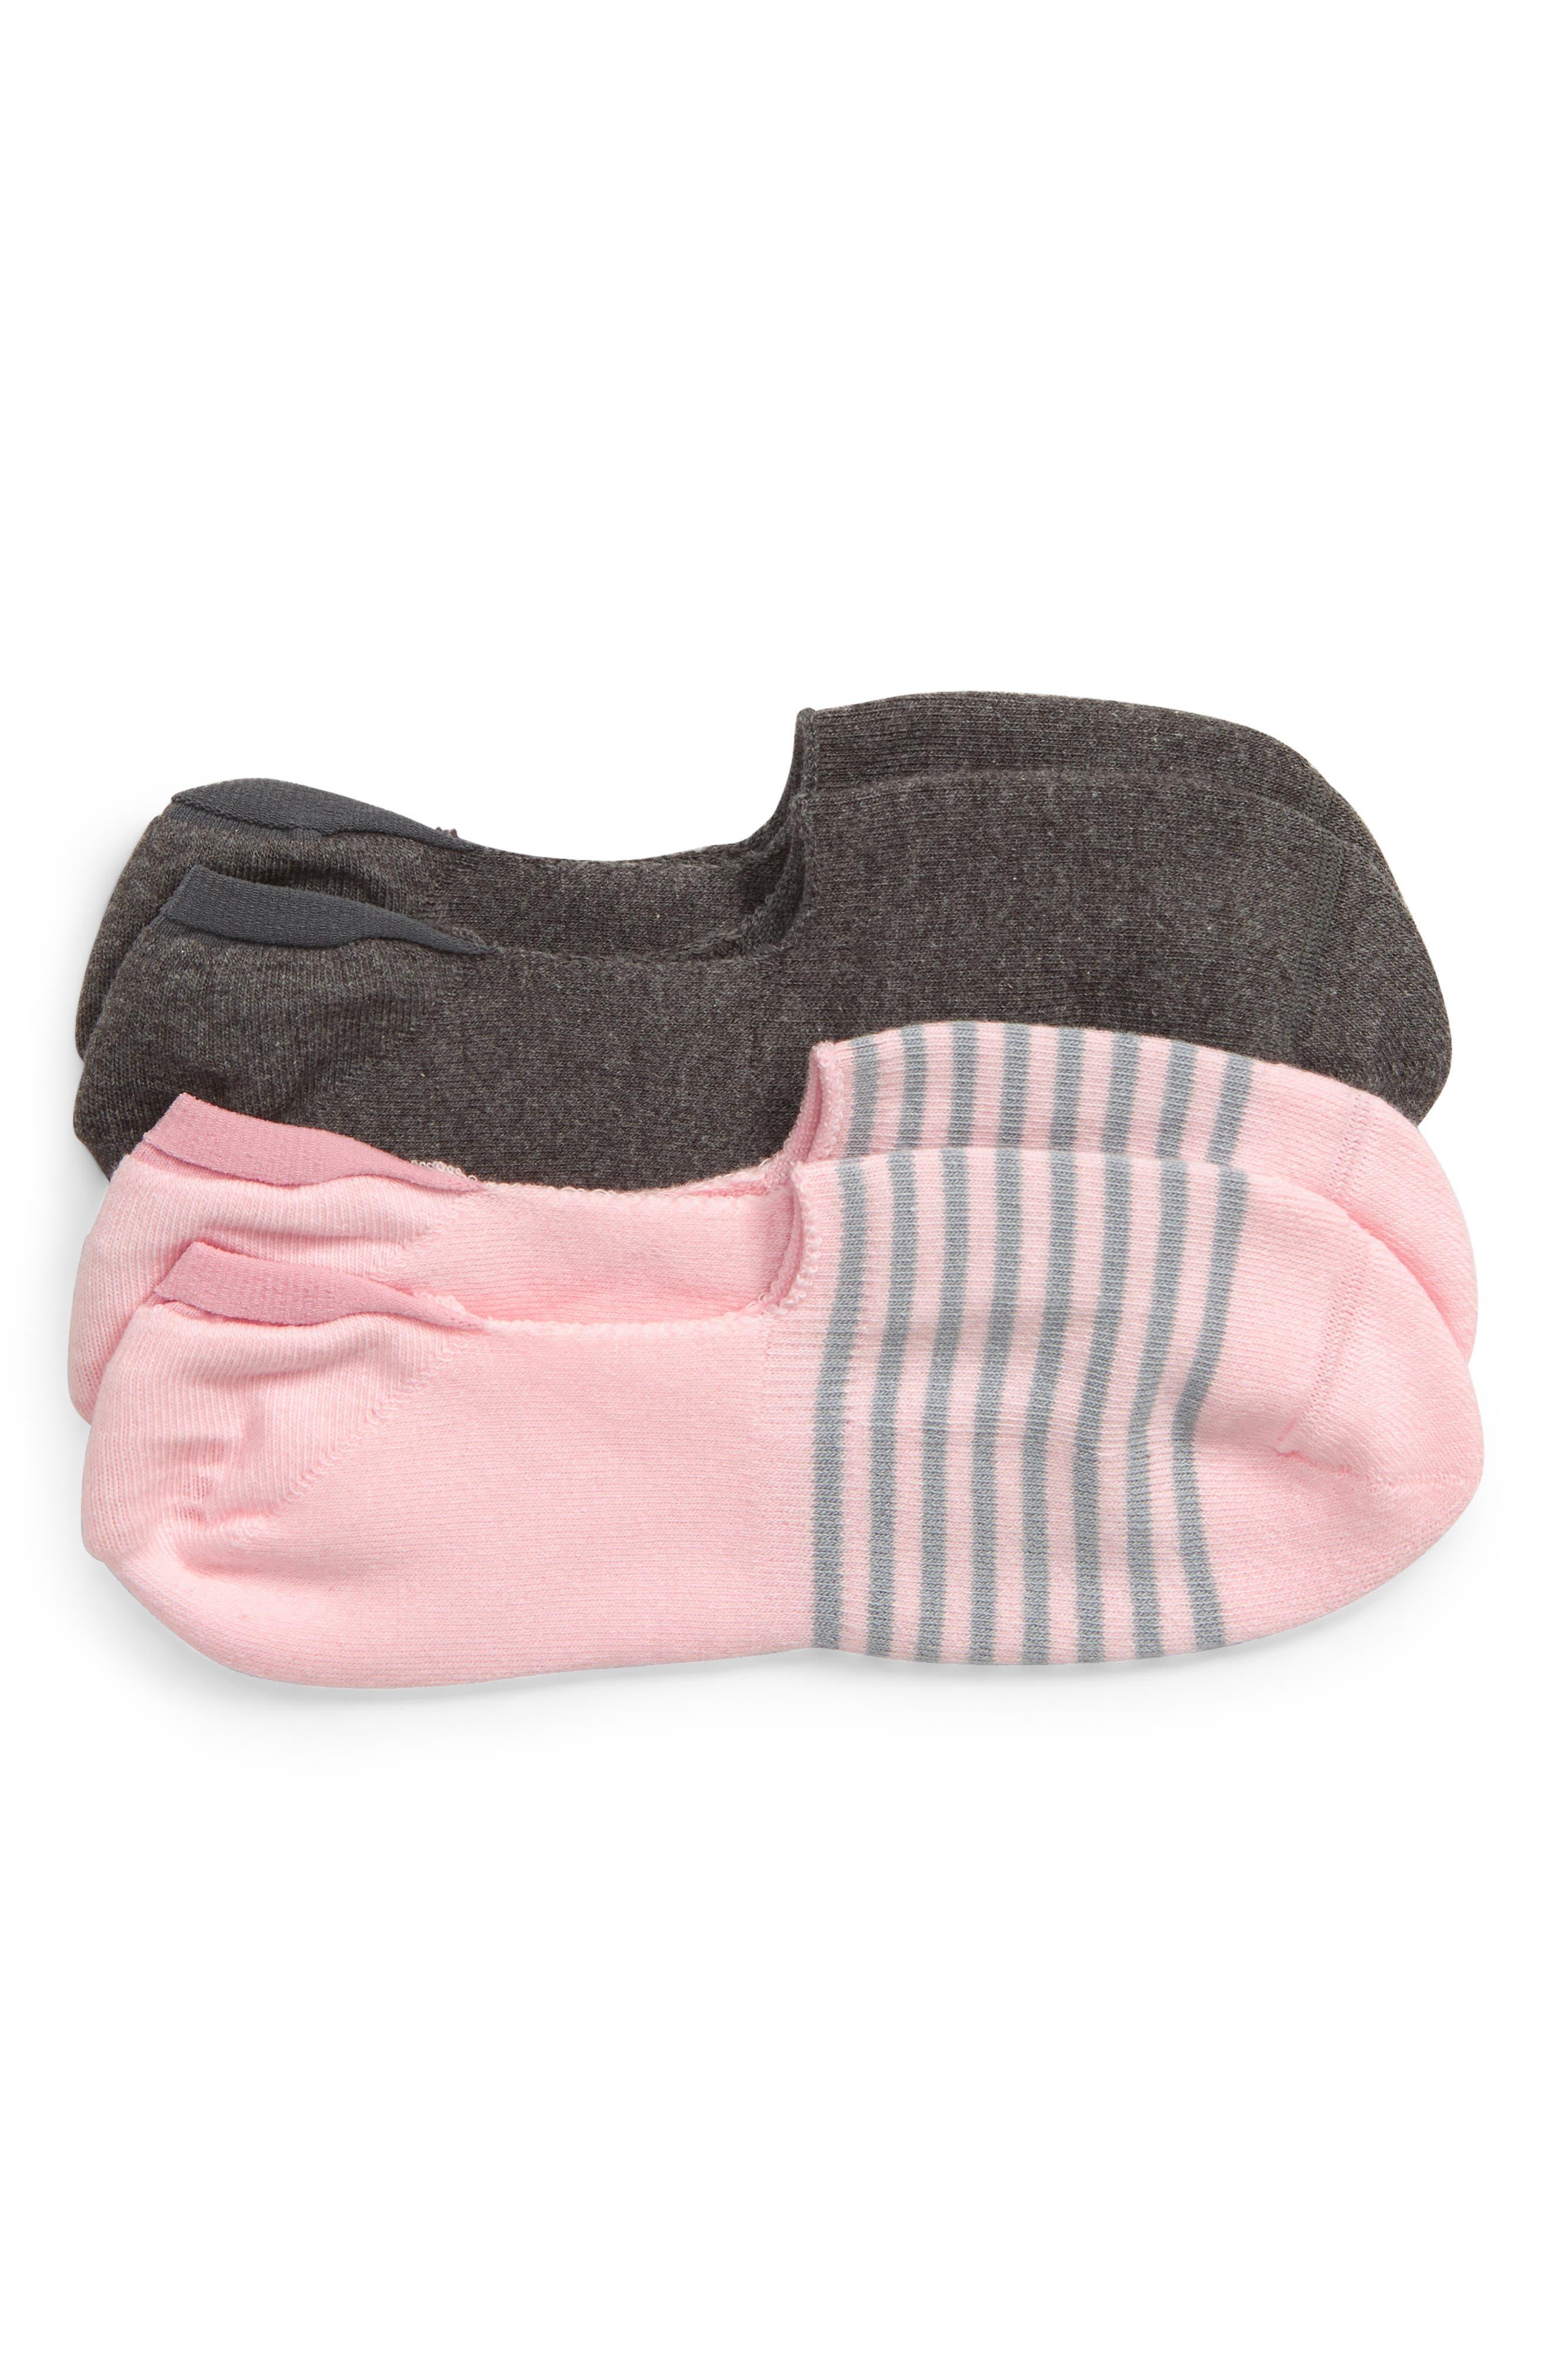 Assorted 2-Pack Liner Socks, Main, color, PINK/ CHARCOAL